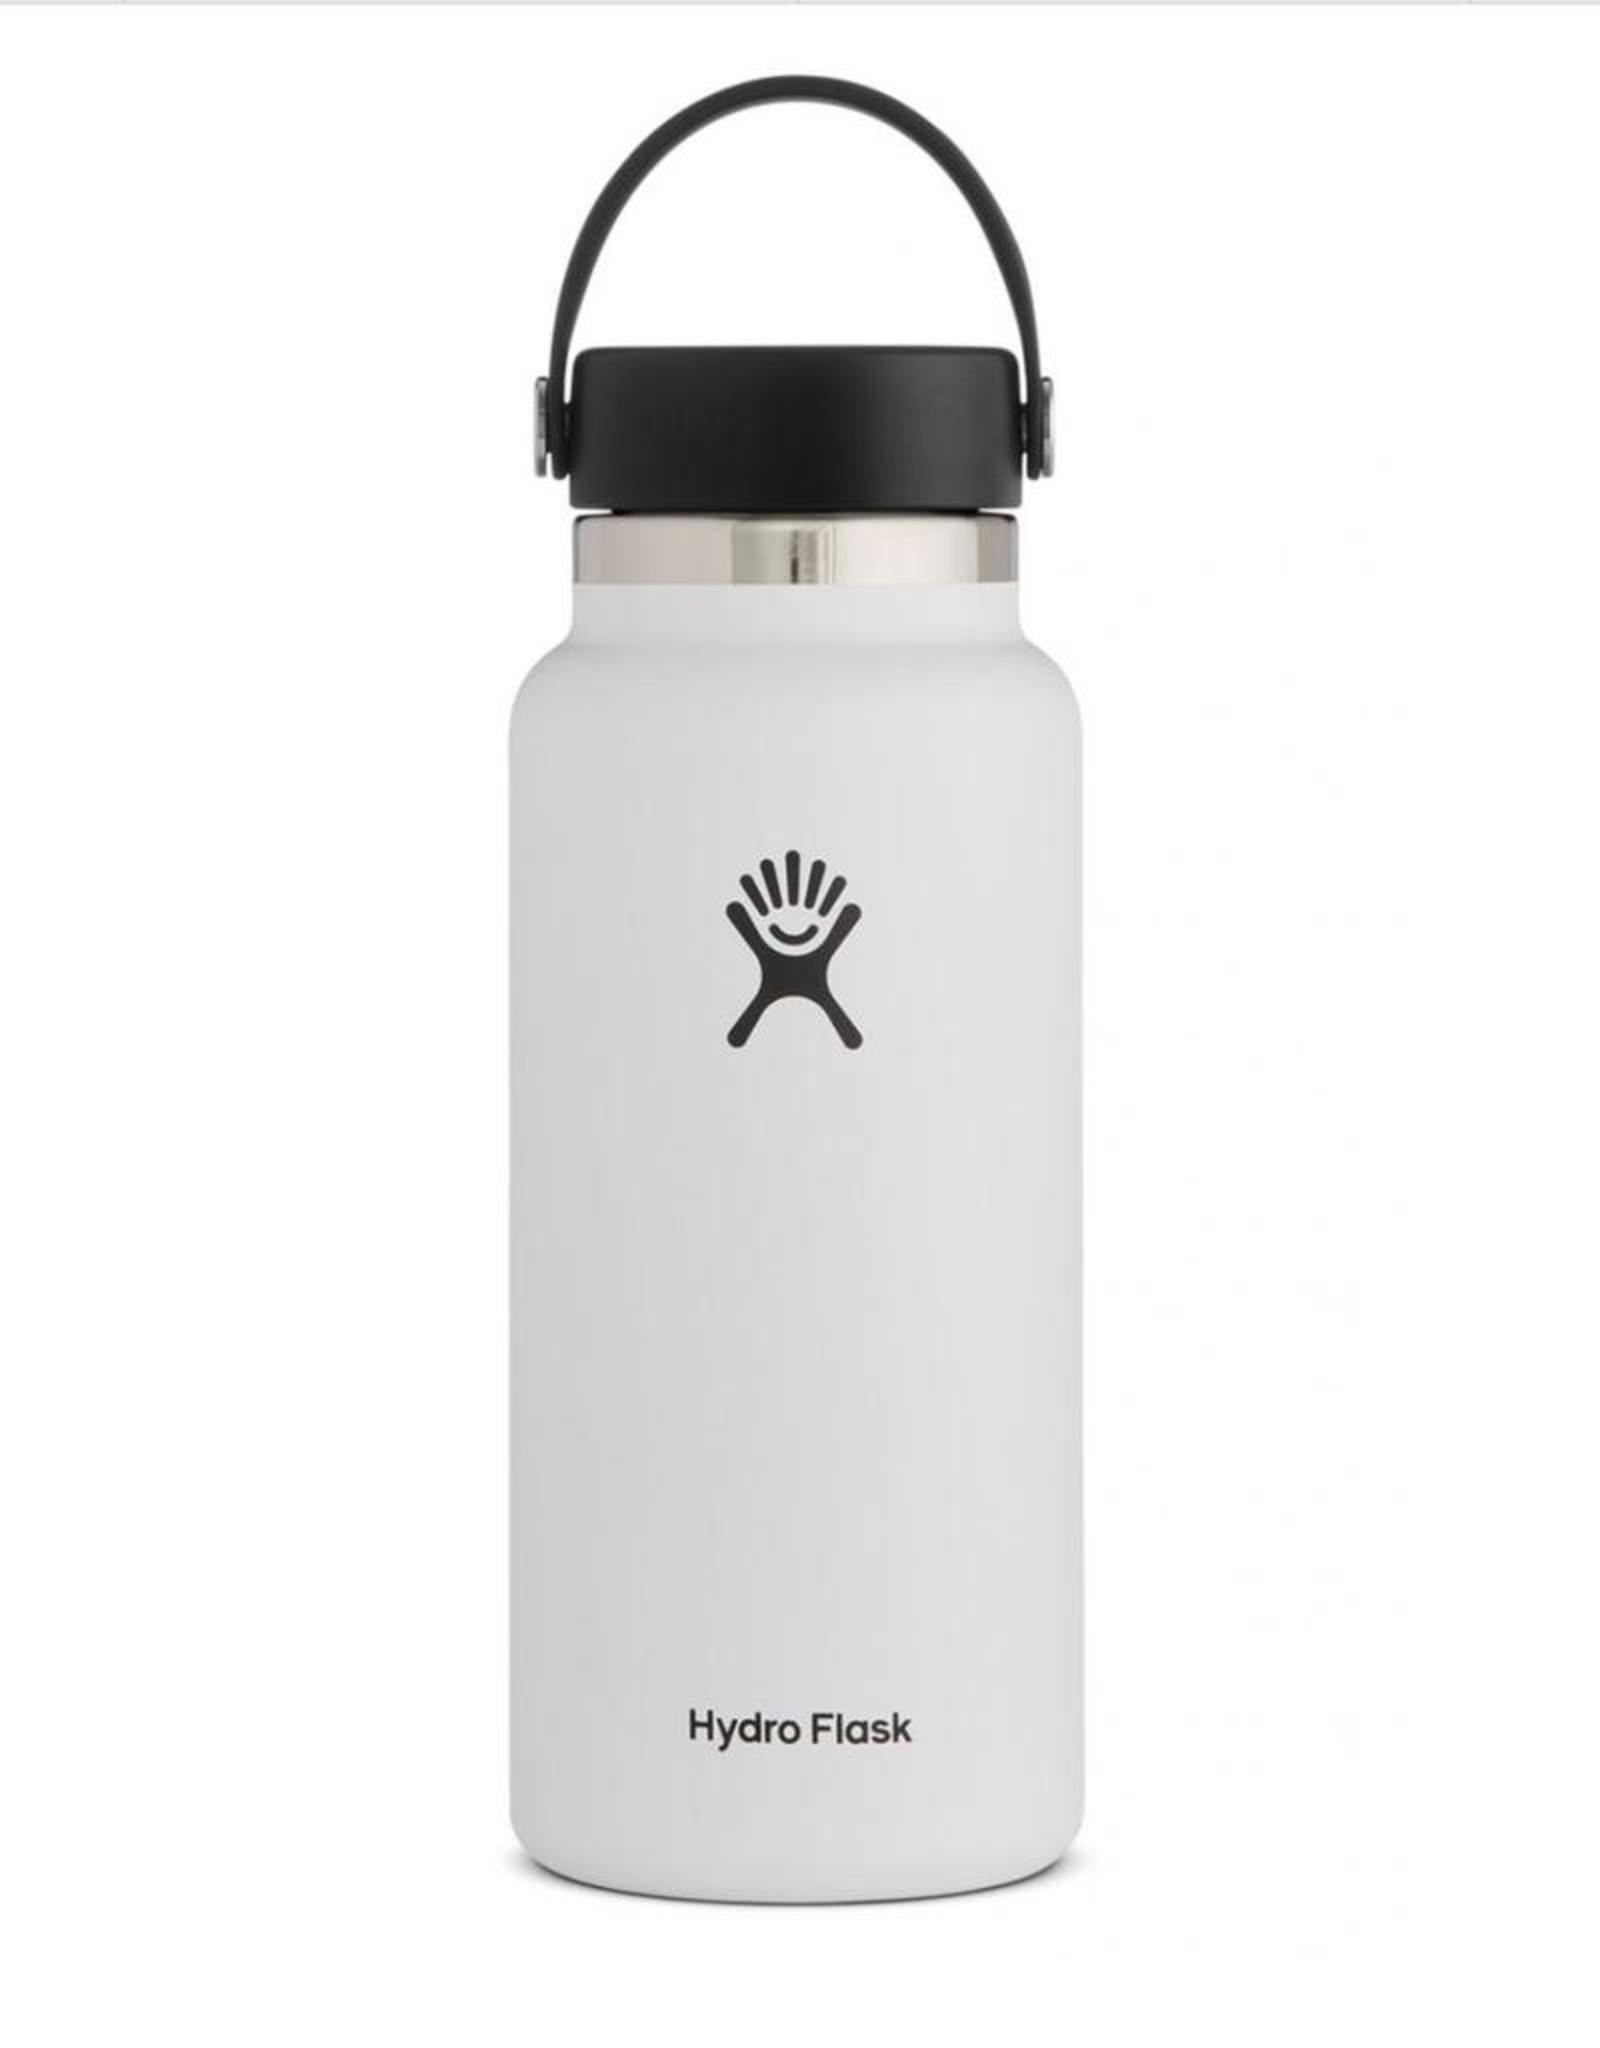 Hydro Flask 32 oz Wide Mouth Flex Cap Bottle in White